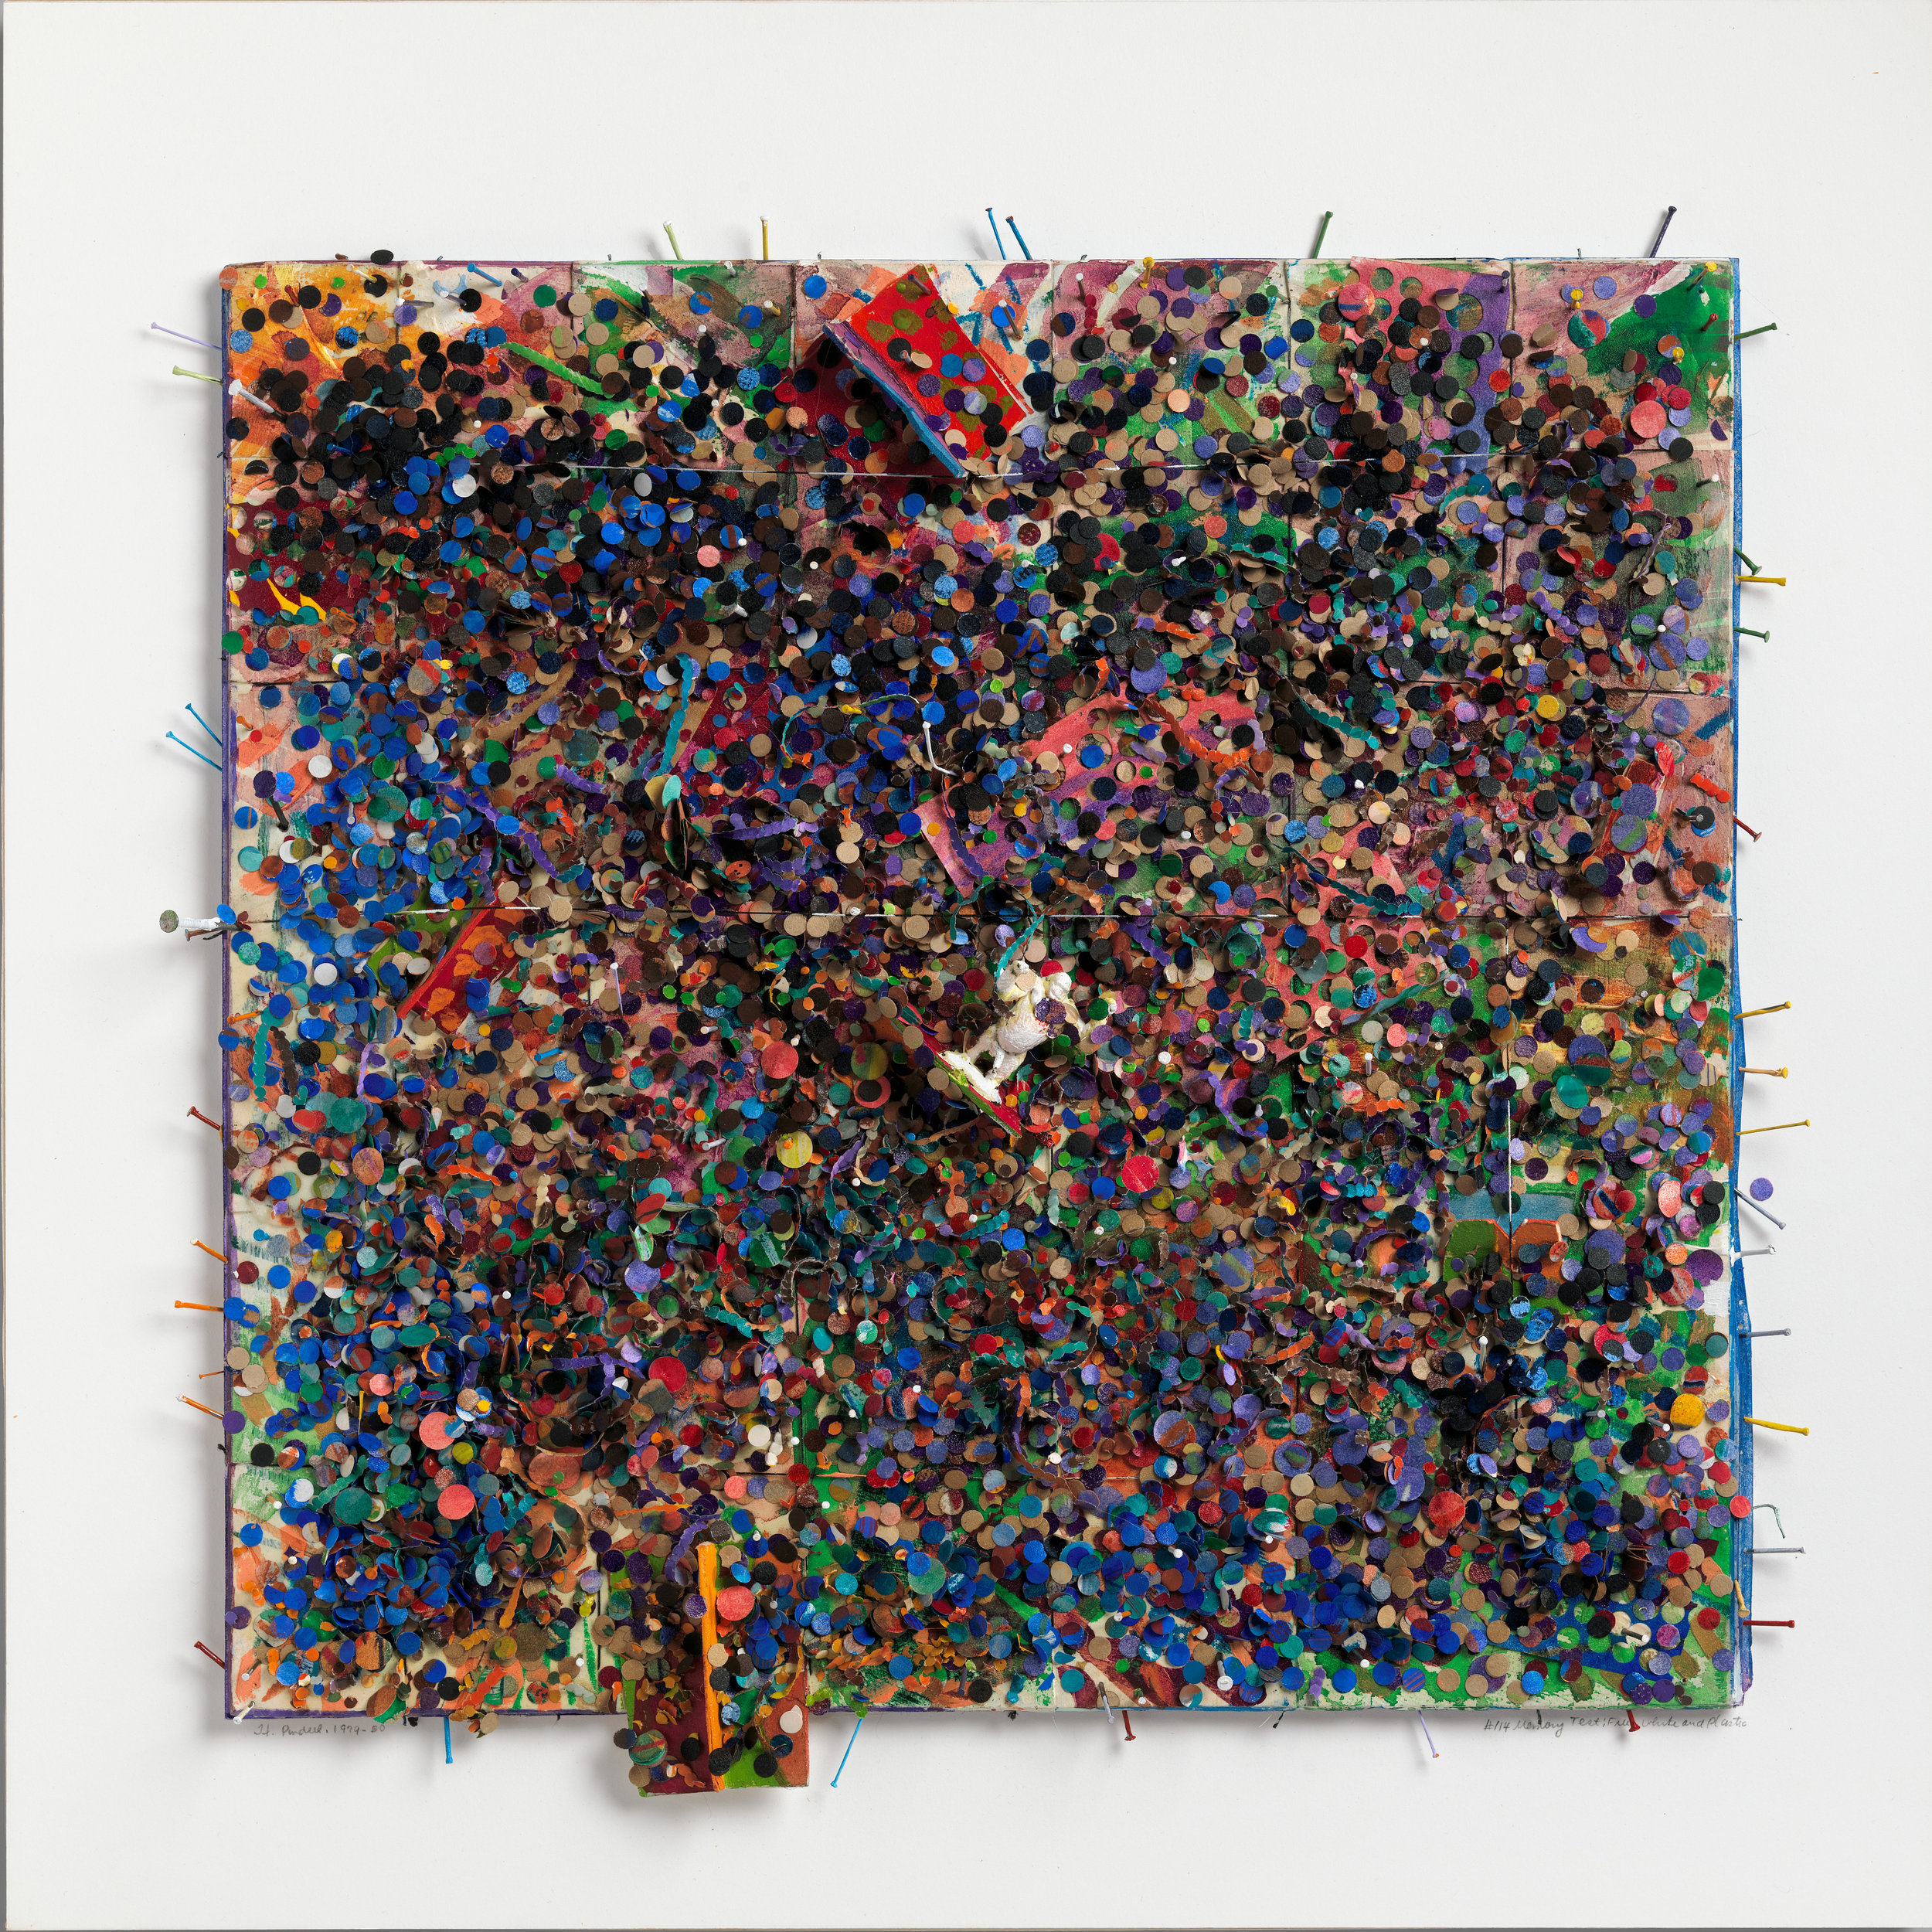 Howardena Pindell,  Memory Test: Free, White & Plastic (#114), (1979–80)  © Howardena Pindell Courtesy The Metropolitan Museum of Art, photo by Hyla Skopitz